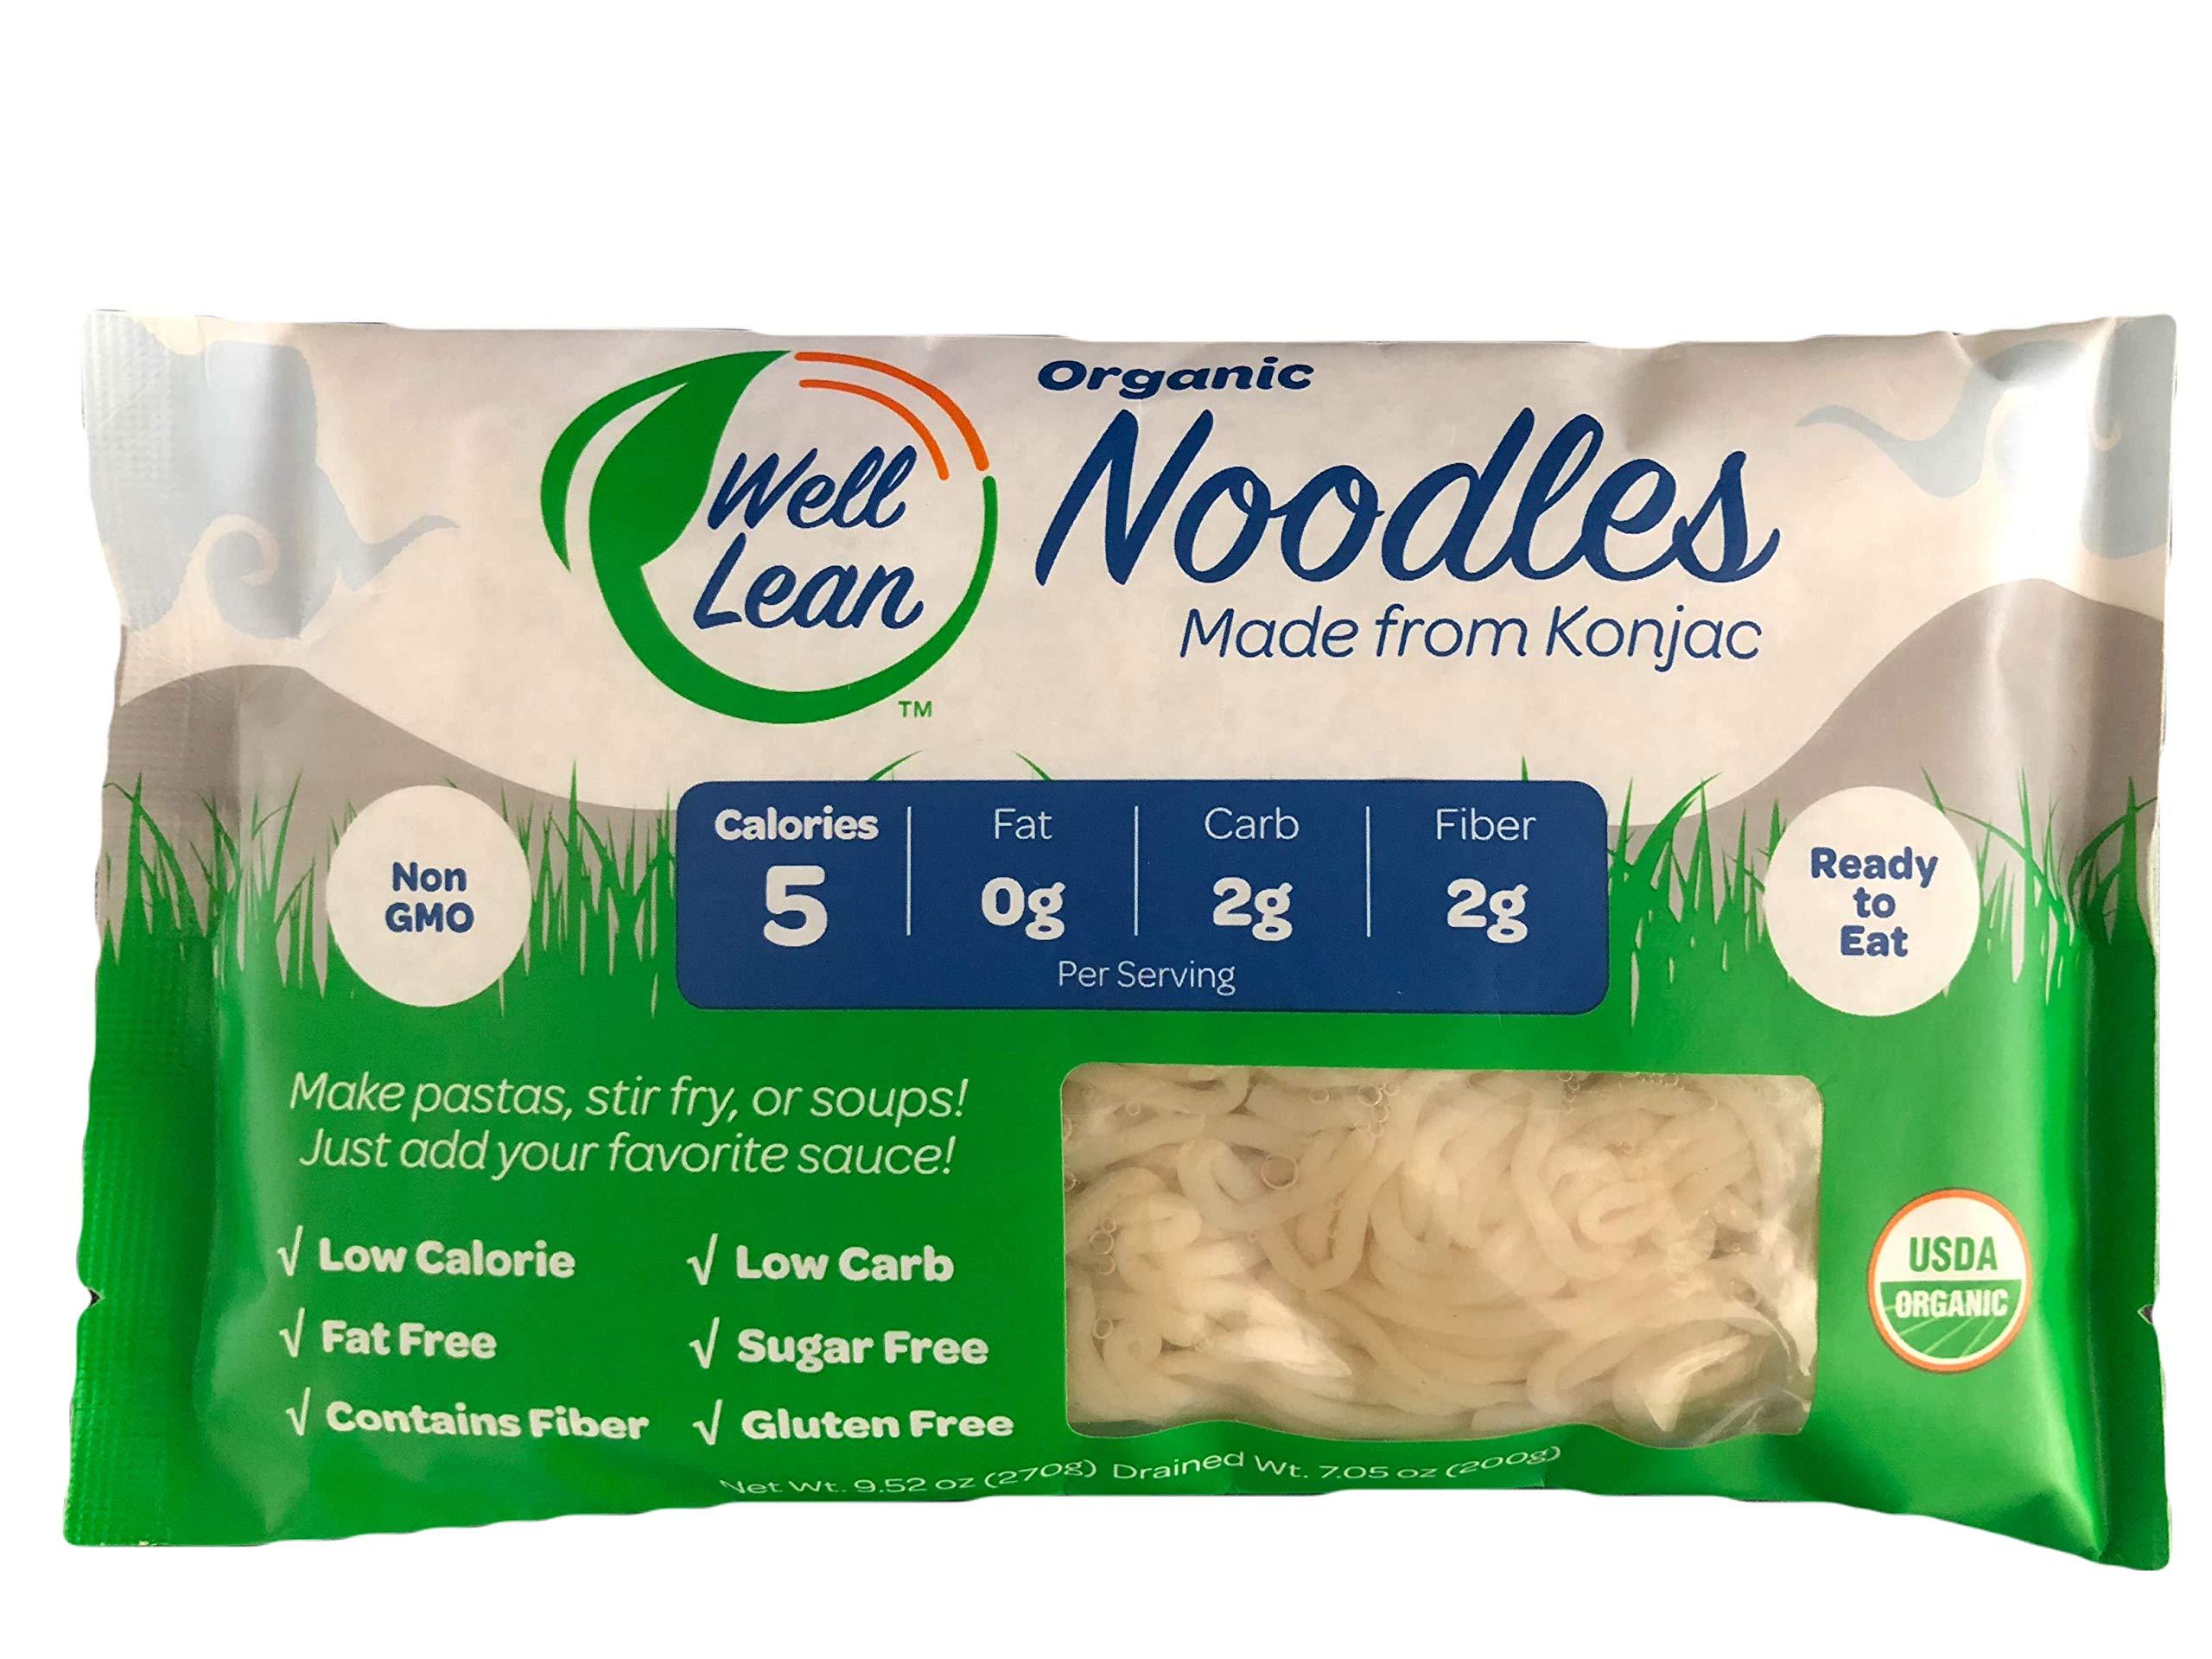 Organic Well Lean Noodles (6 Pack/57.1 oz) - Premium Shirataki [Ready to Eat, No Boiling, ODOR FREE, Non-GMO] - LOW CALORIE, LOW CARB - Gluten Free, Vegan, Keto - Premium Konjac Pasta